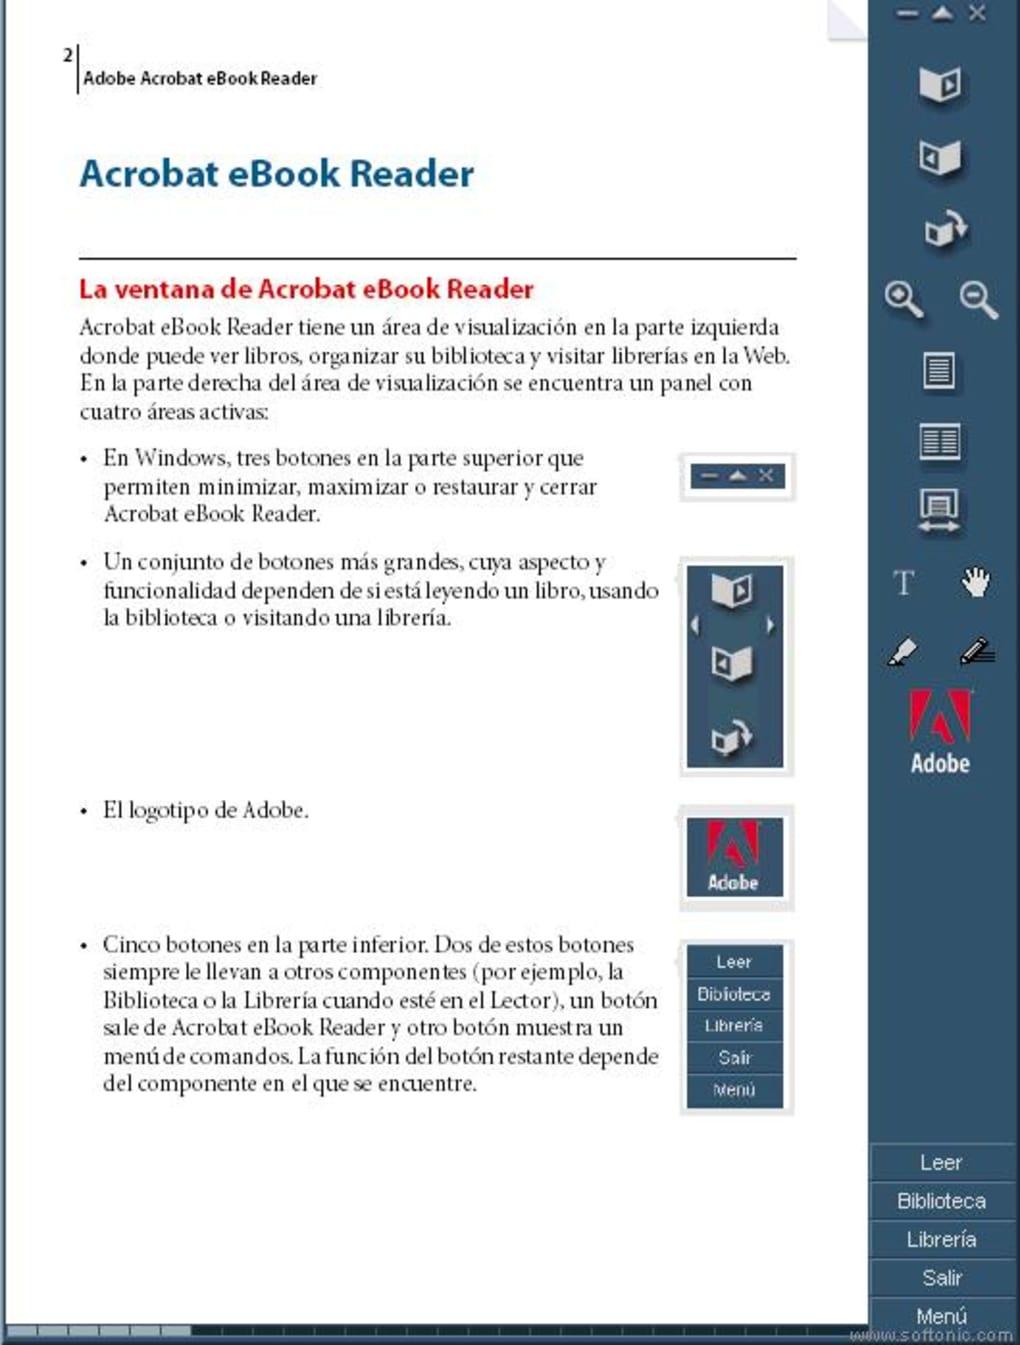 Adobe acrobat ebook reader download view full description adobe acrobat ebook reader pros fandeluxe Choice Image